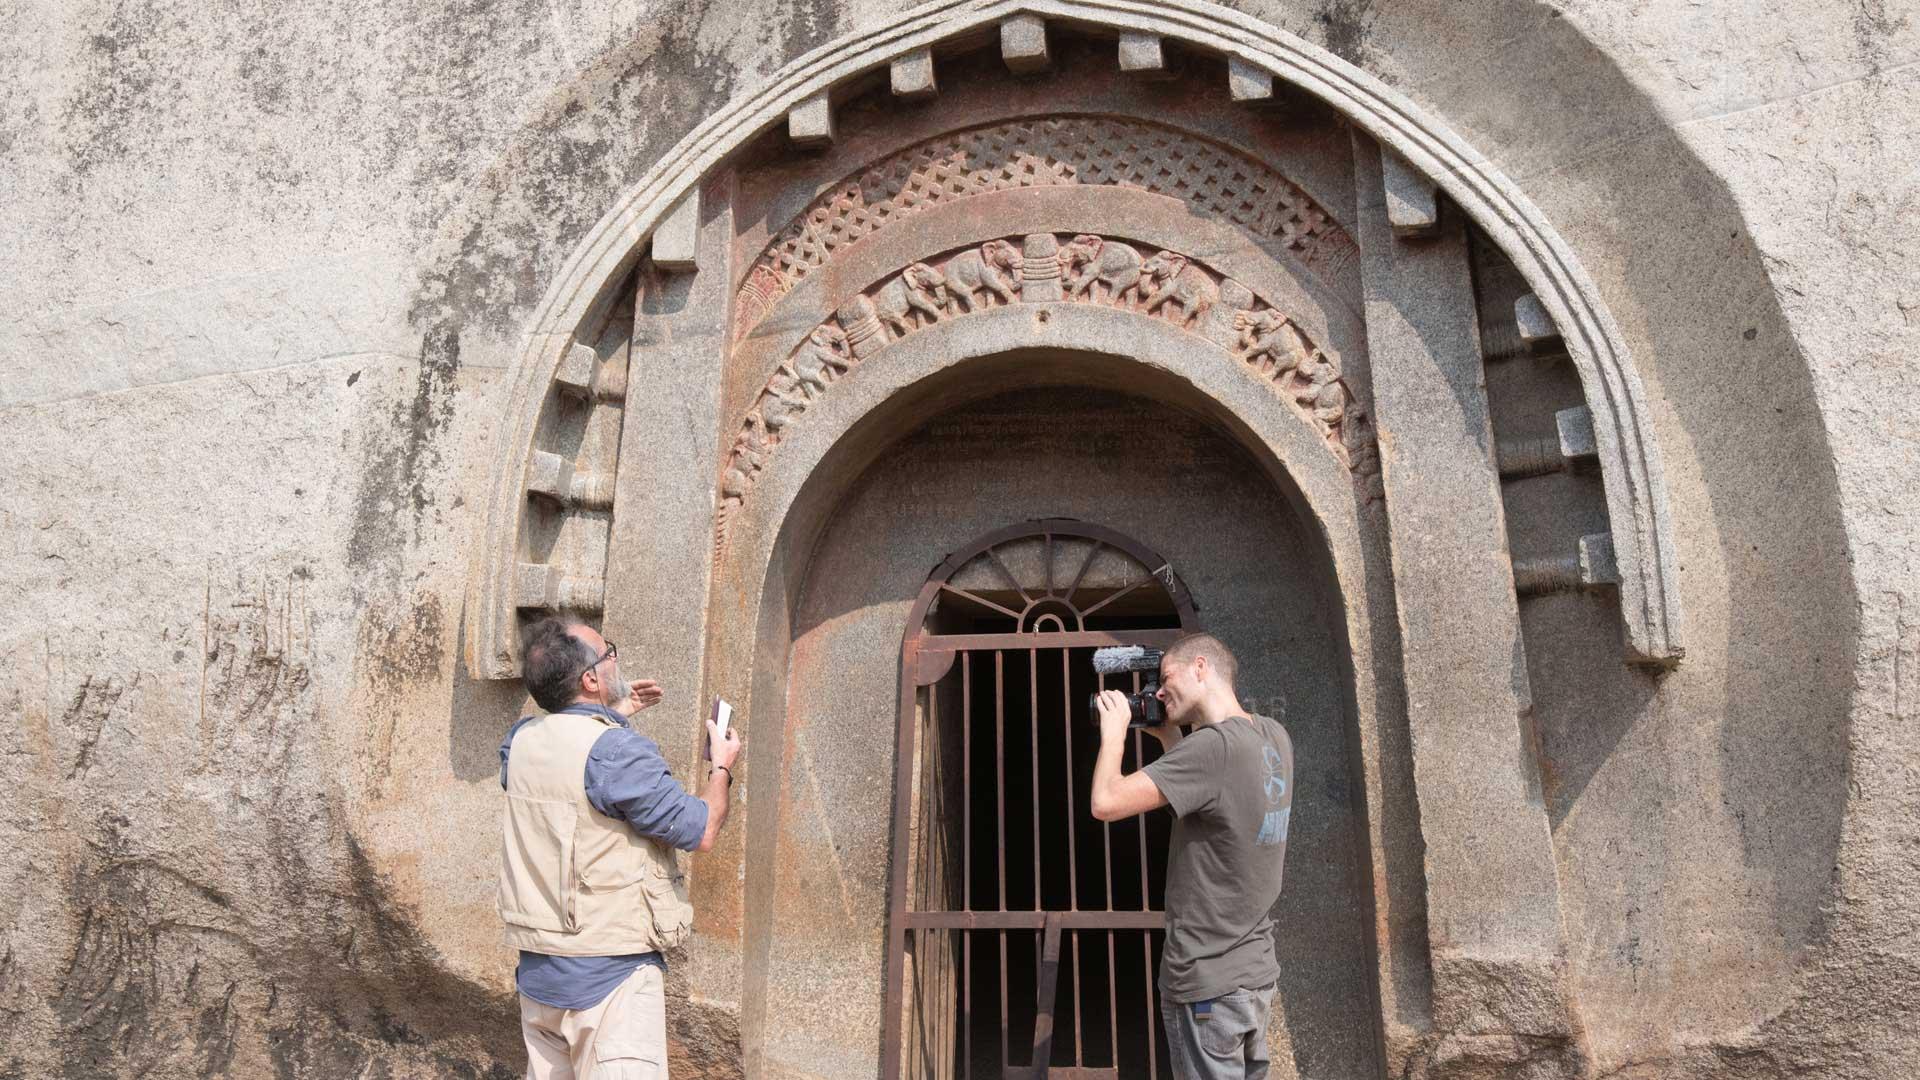 Barabar-BAM-film-granit-miroir-pyramide-inde-yoga-archeologie-16